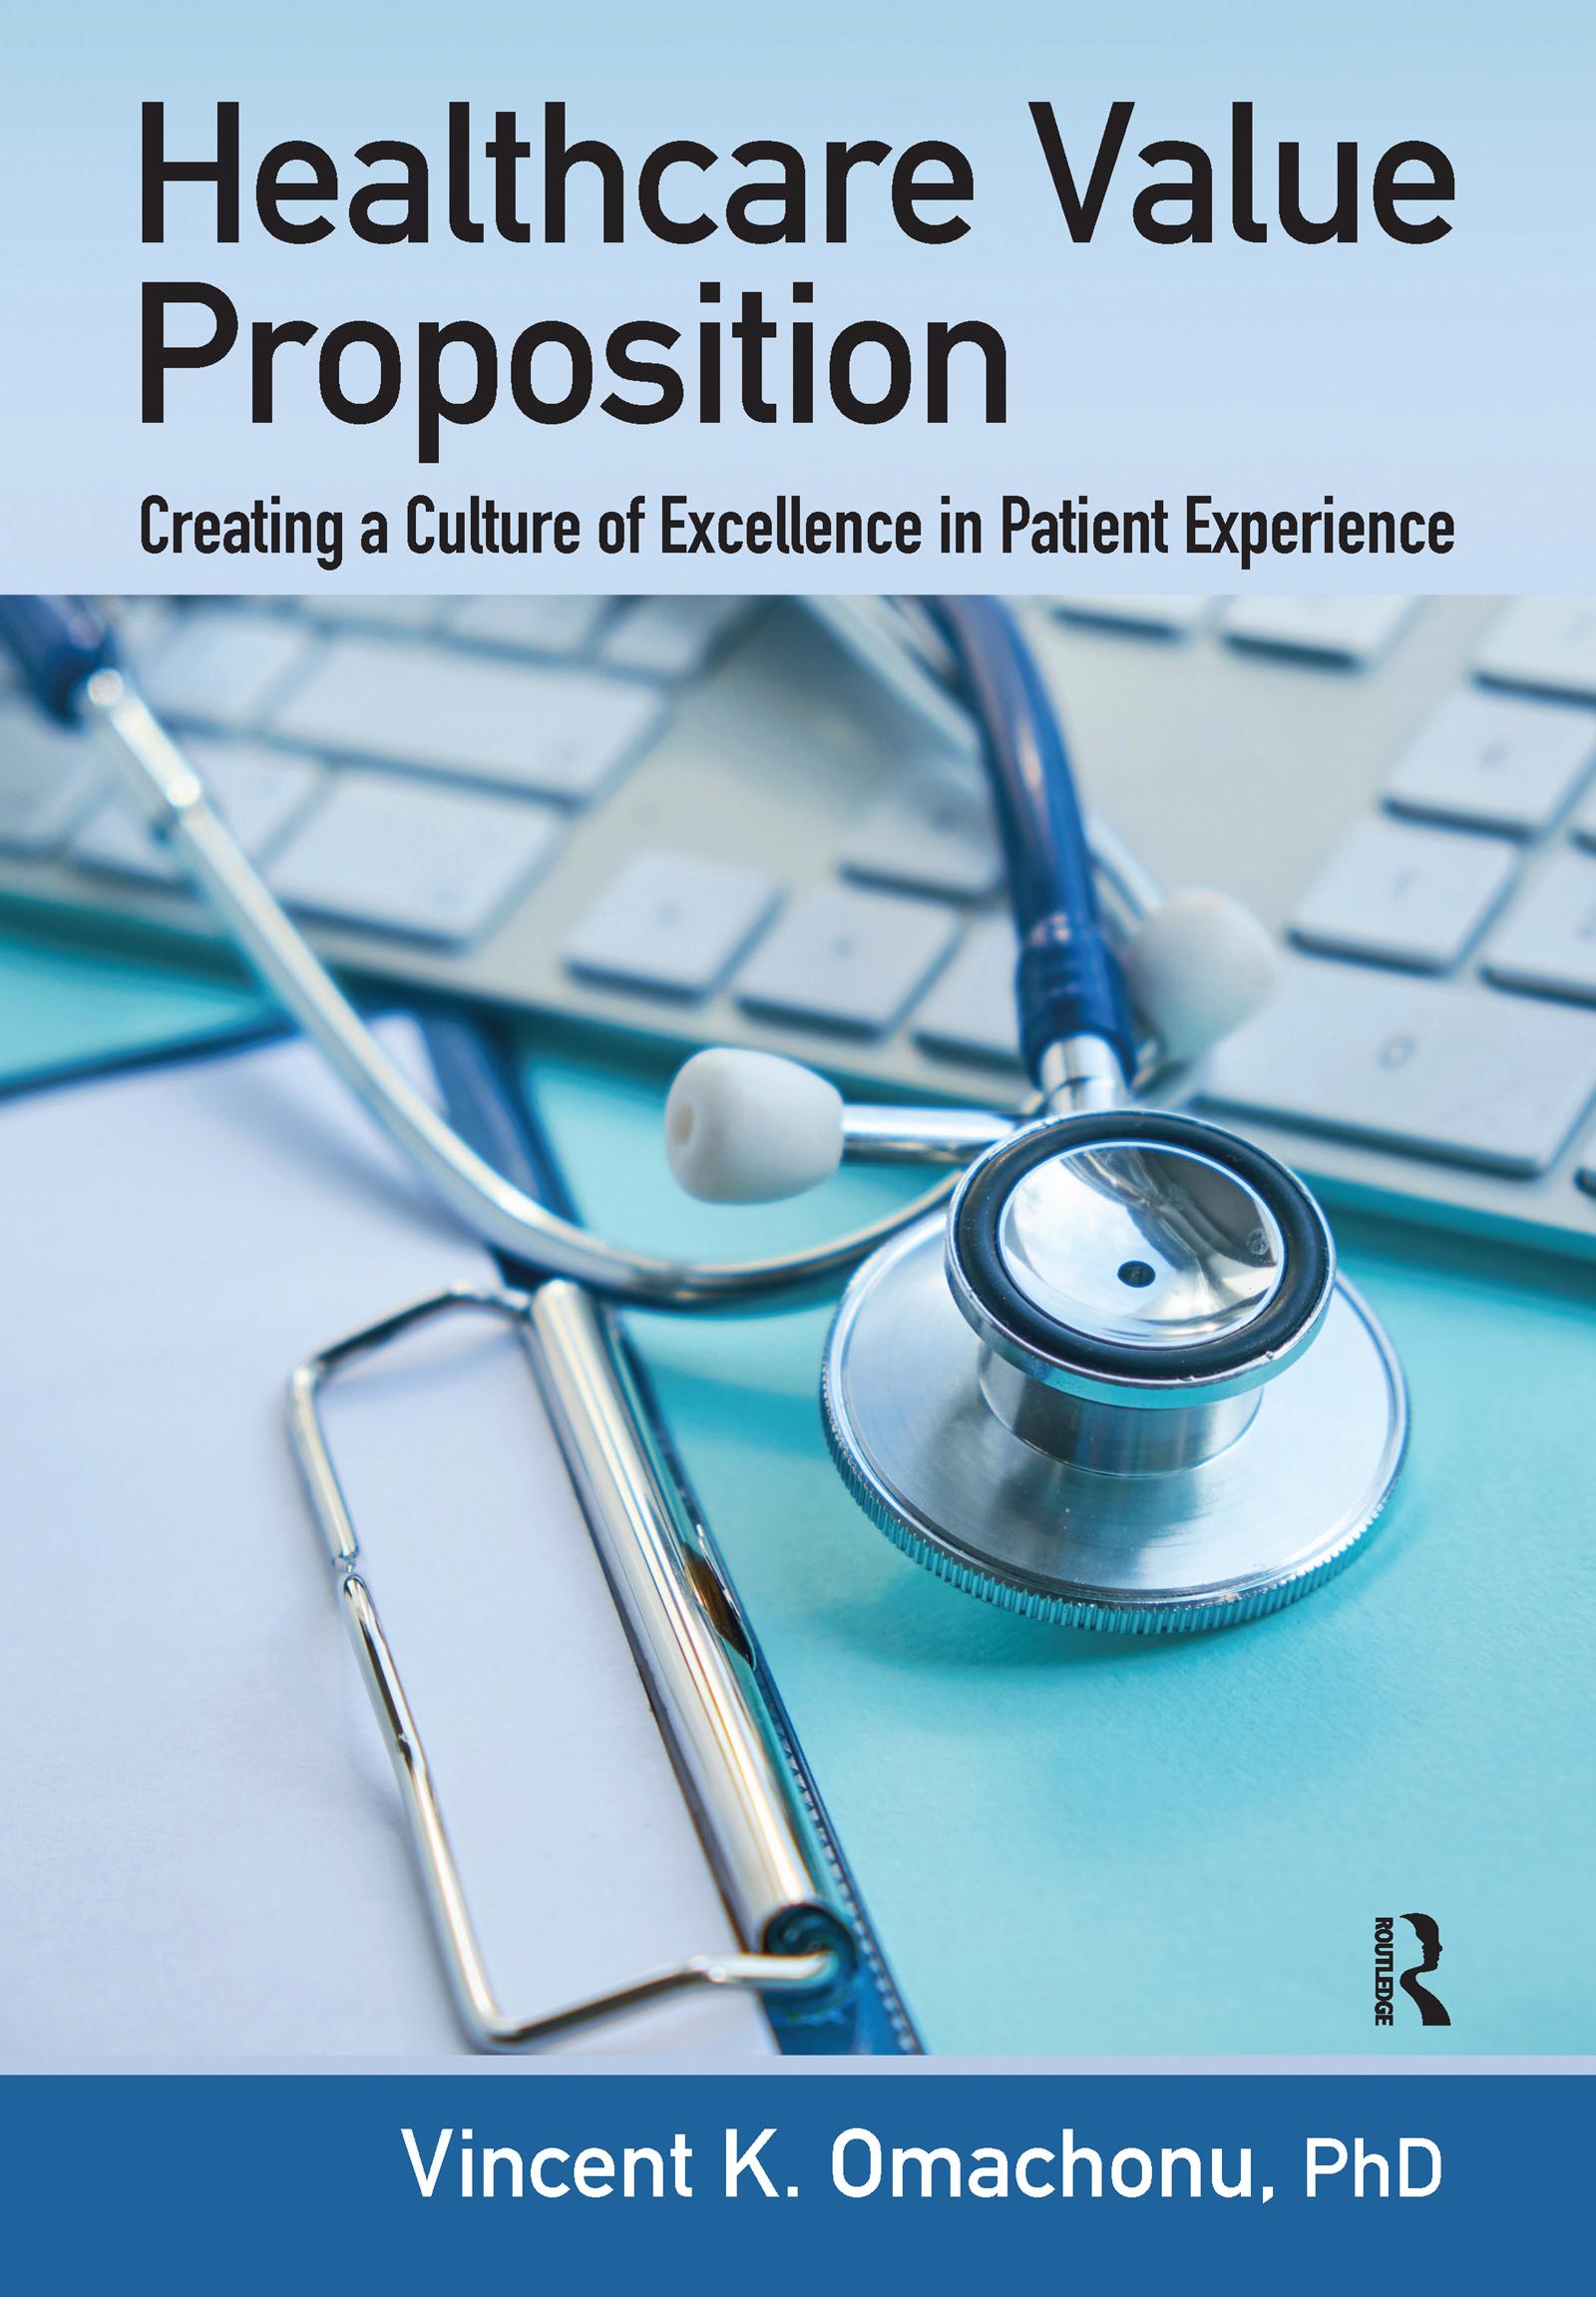 Healthcare Value Proposition